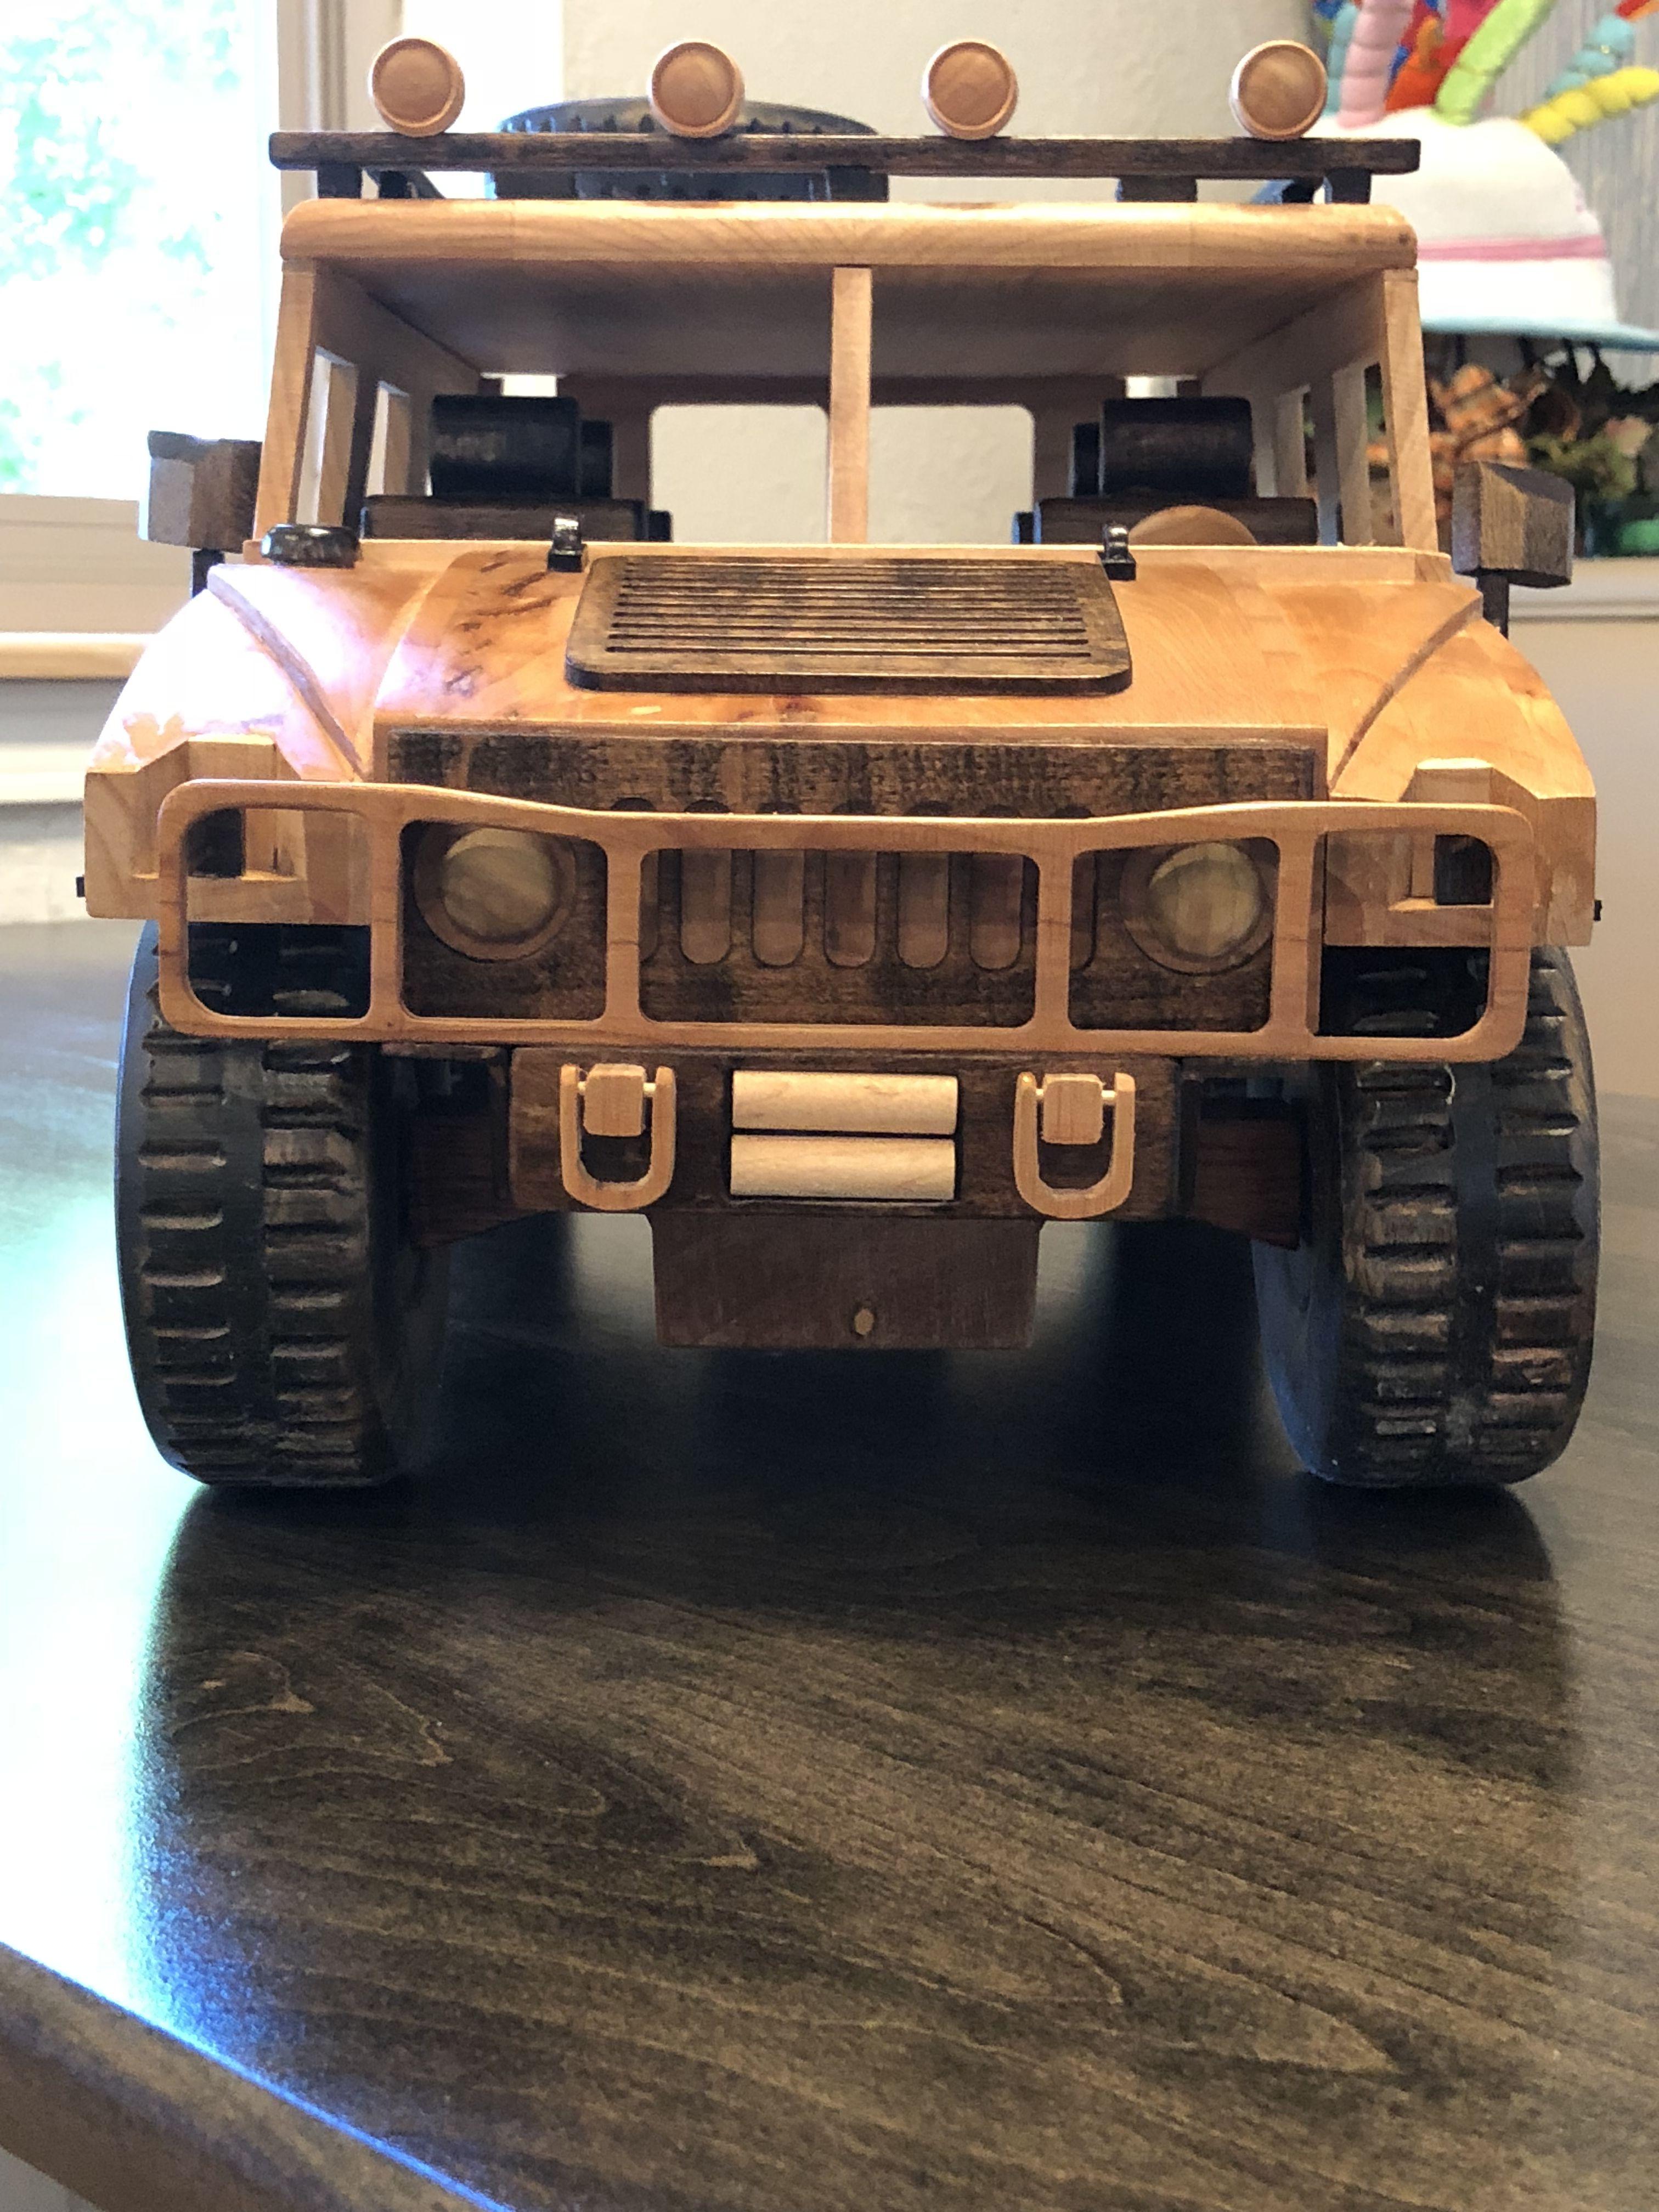 Hummer car toys  ToysandJoys hummer  Wooden models  Pinterest  Model and Hummer